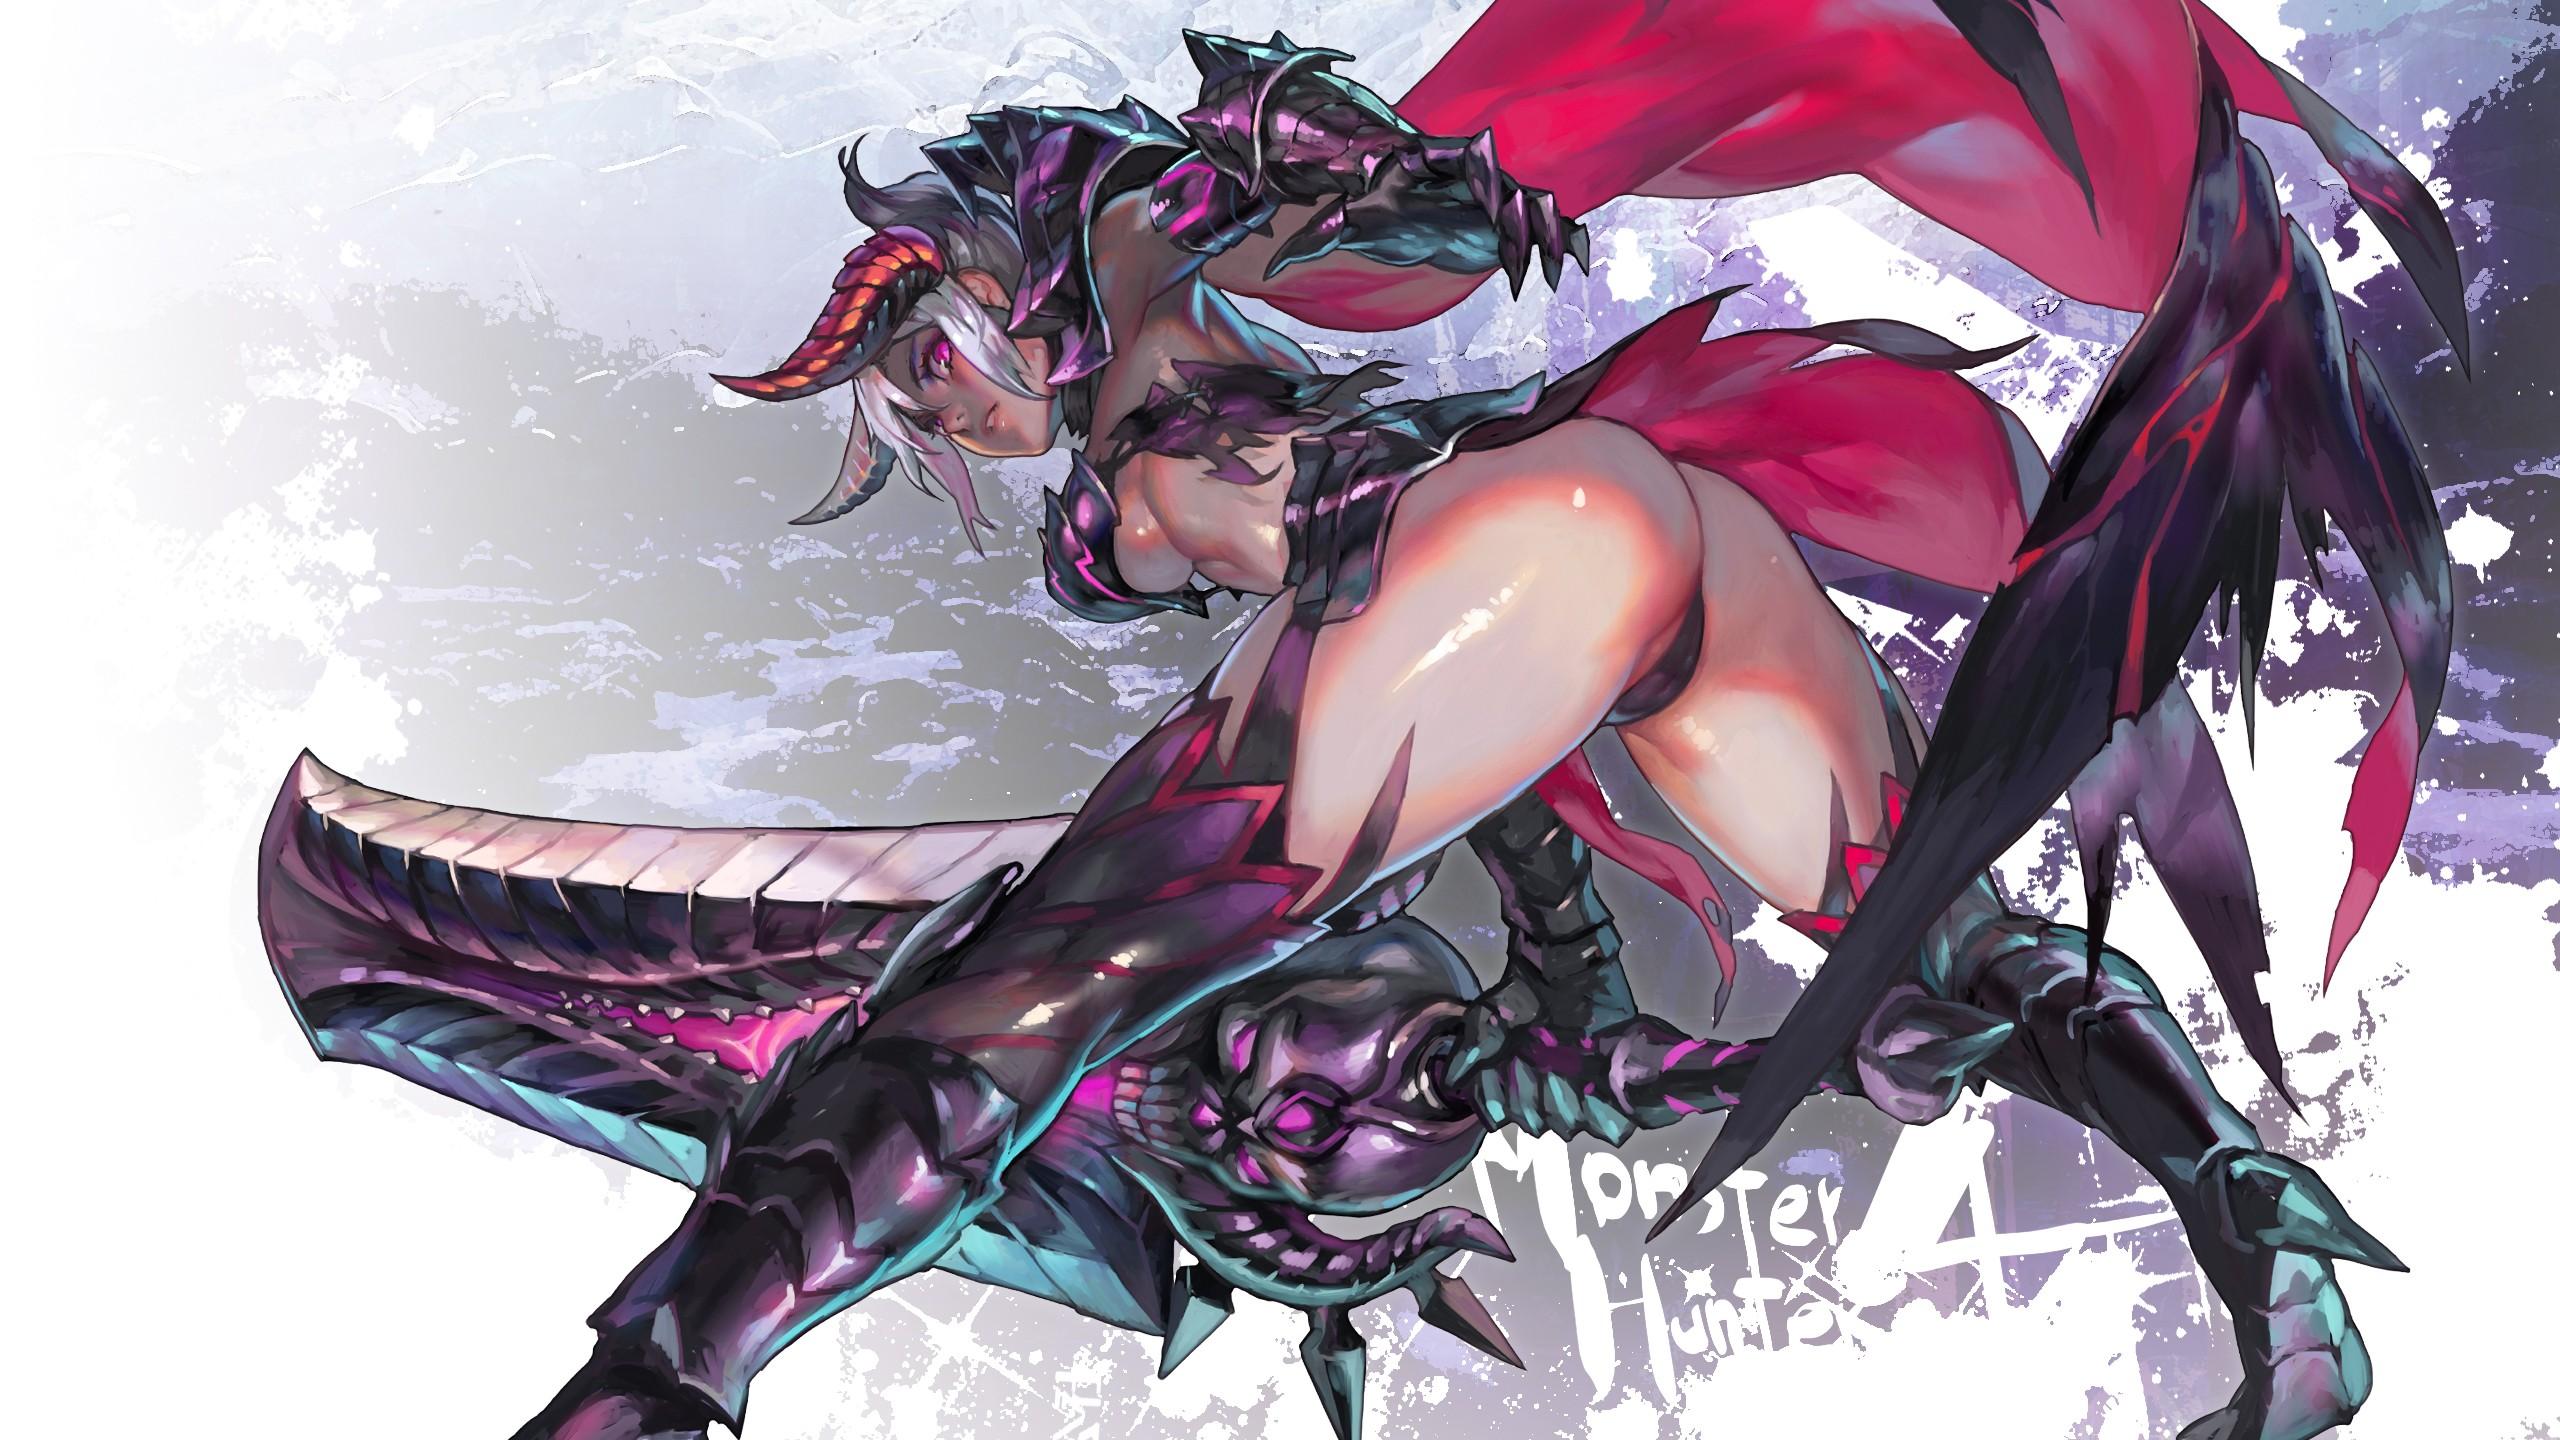 Download anime high monster sex women hentia galleries